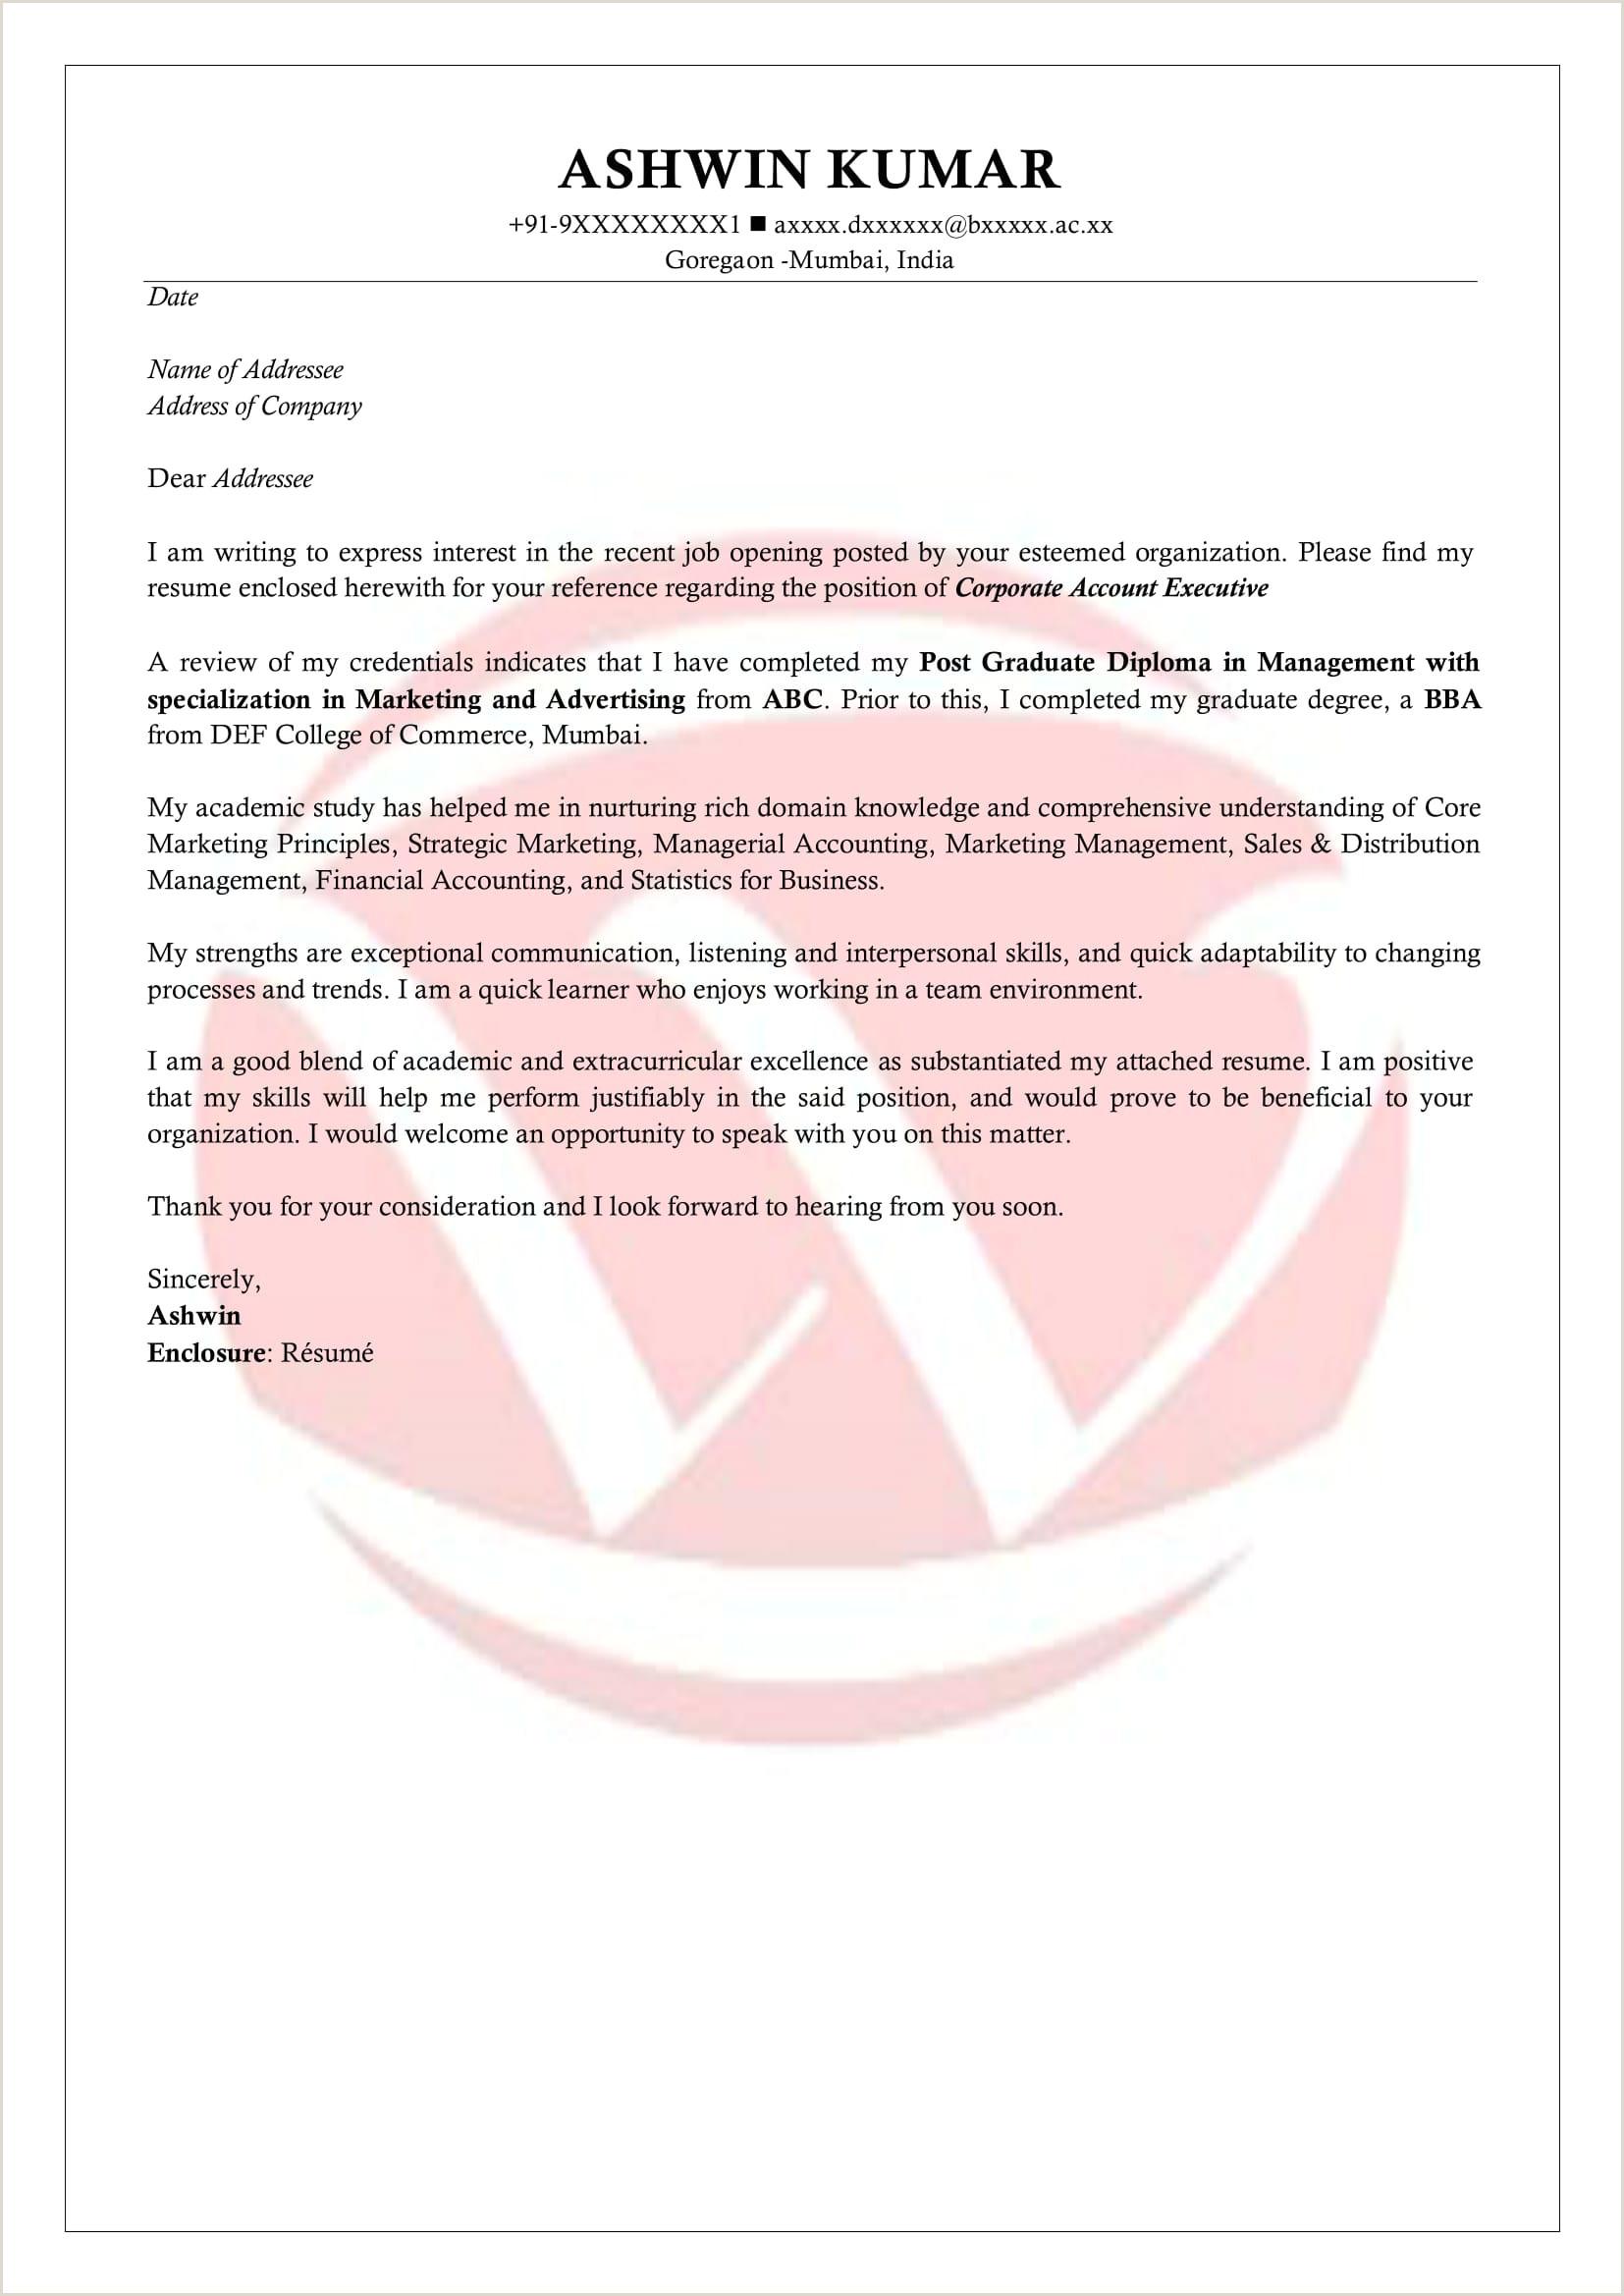 Fresher Resume Format For Web Developer Freshers Sample Cover Letter Format Download Cover Letter